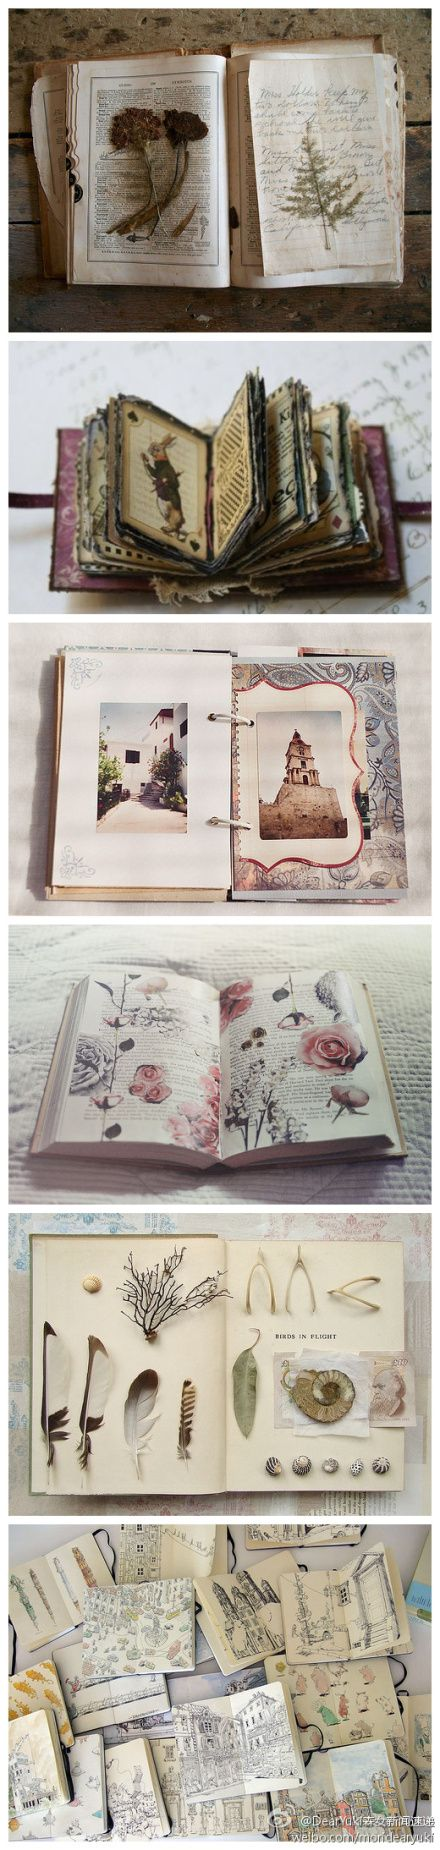 Sketchbook/Journal.